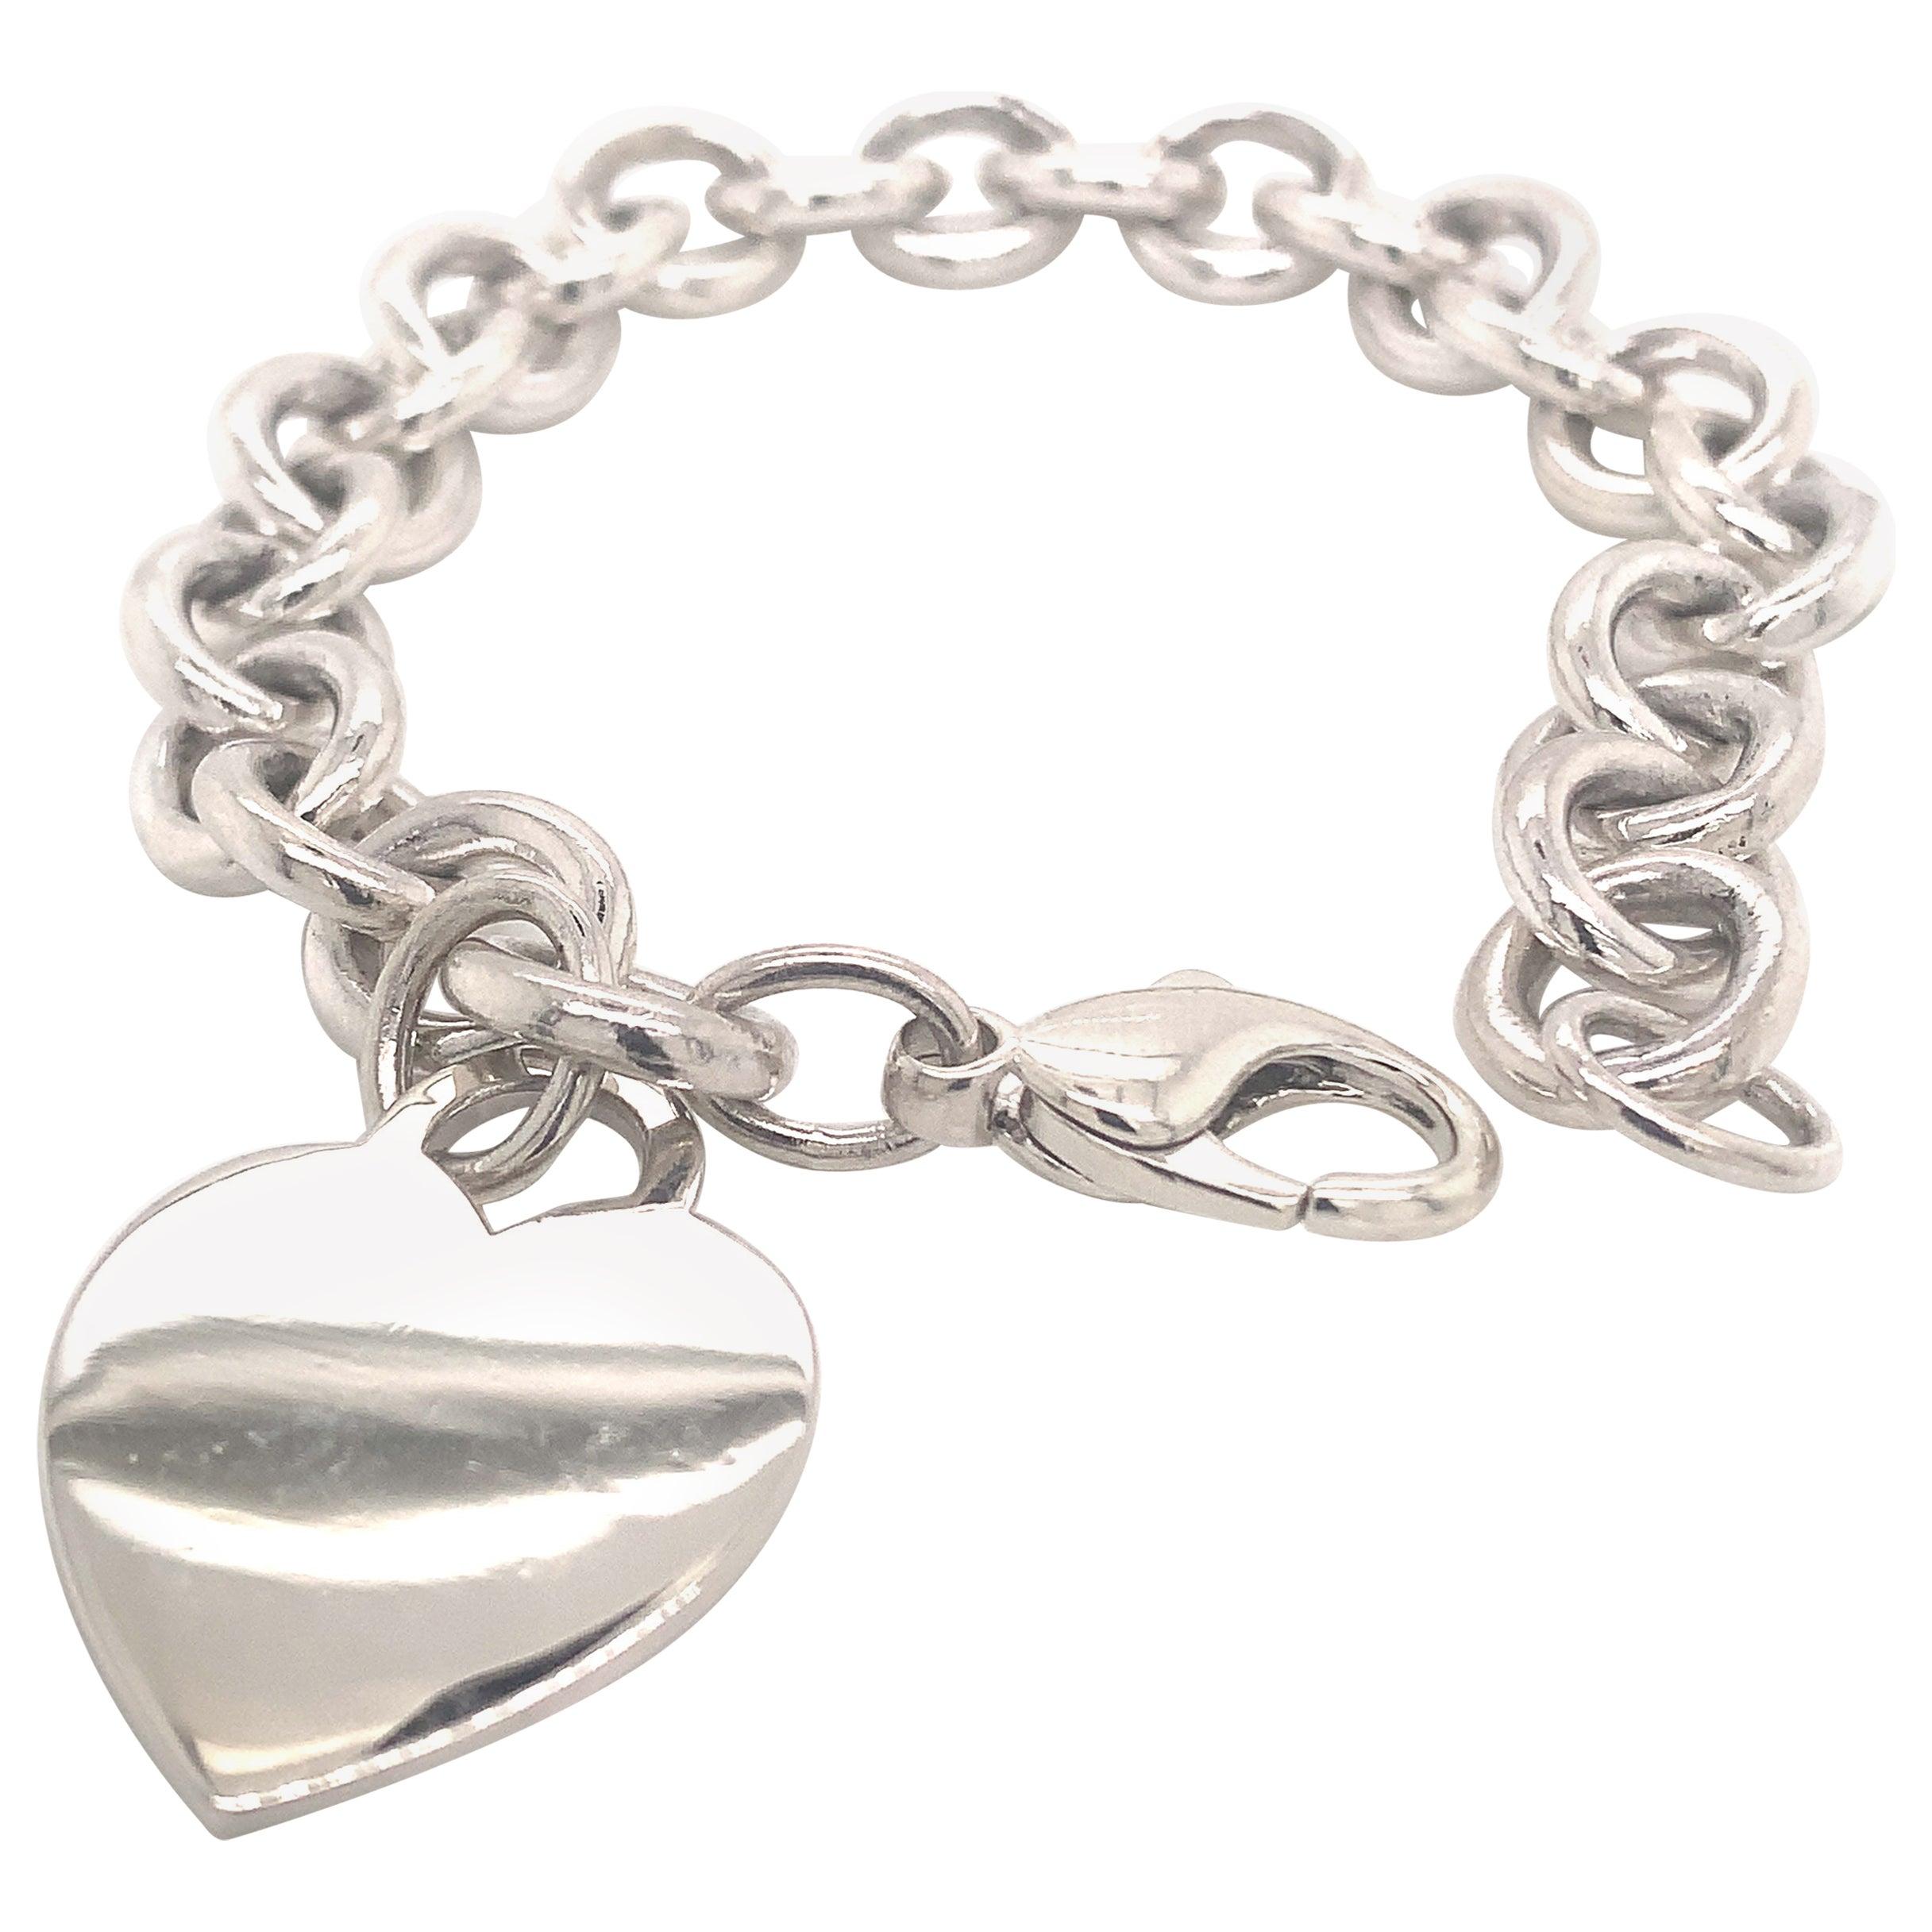 Tiffany & Co. Estate Sterling Silver Bracelet